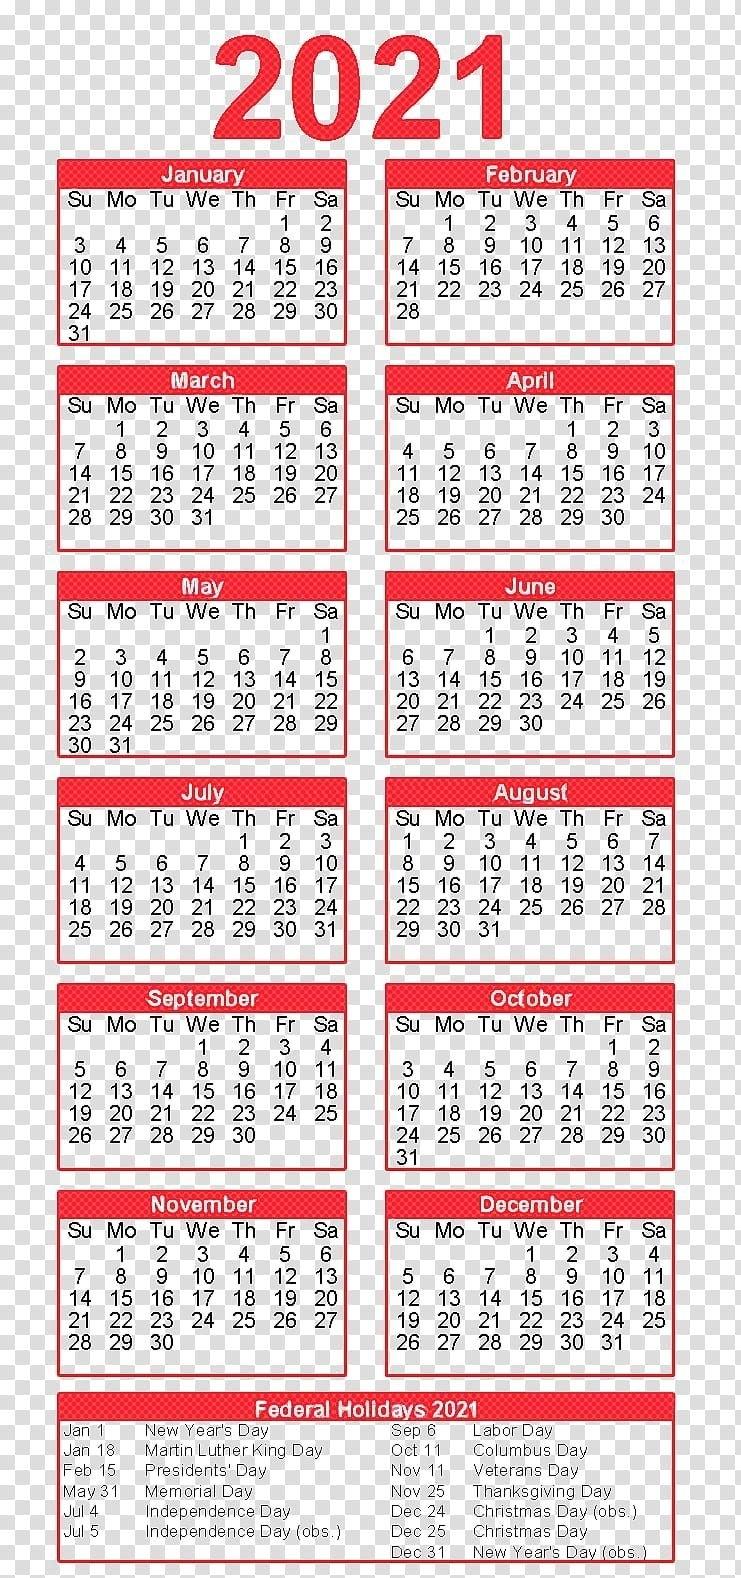 Printable Hebrew Calendar 2021 - Example Calendar Printable in Ucsb 2019 2021 Calendar